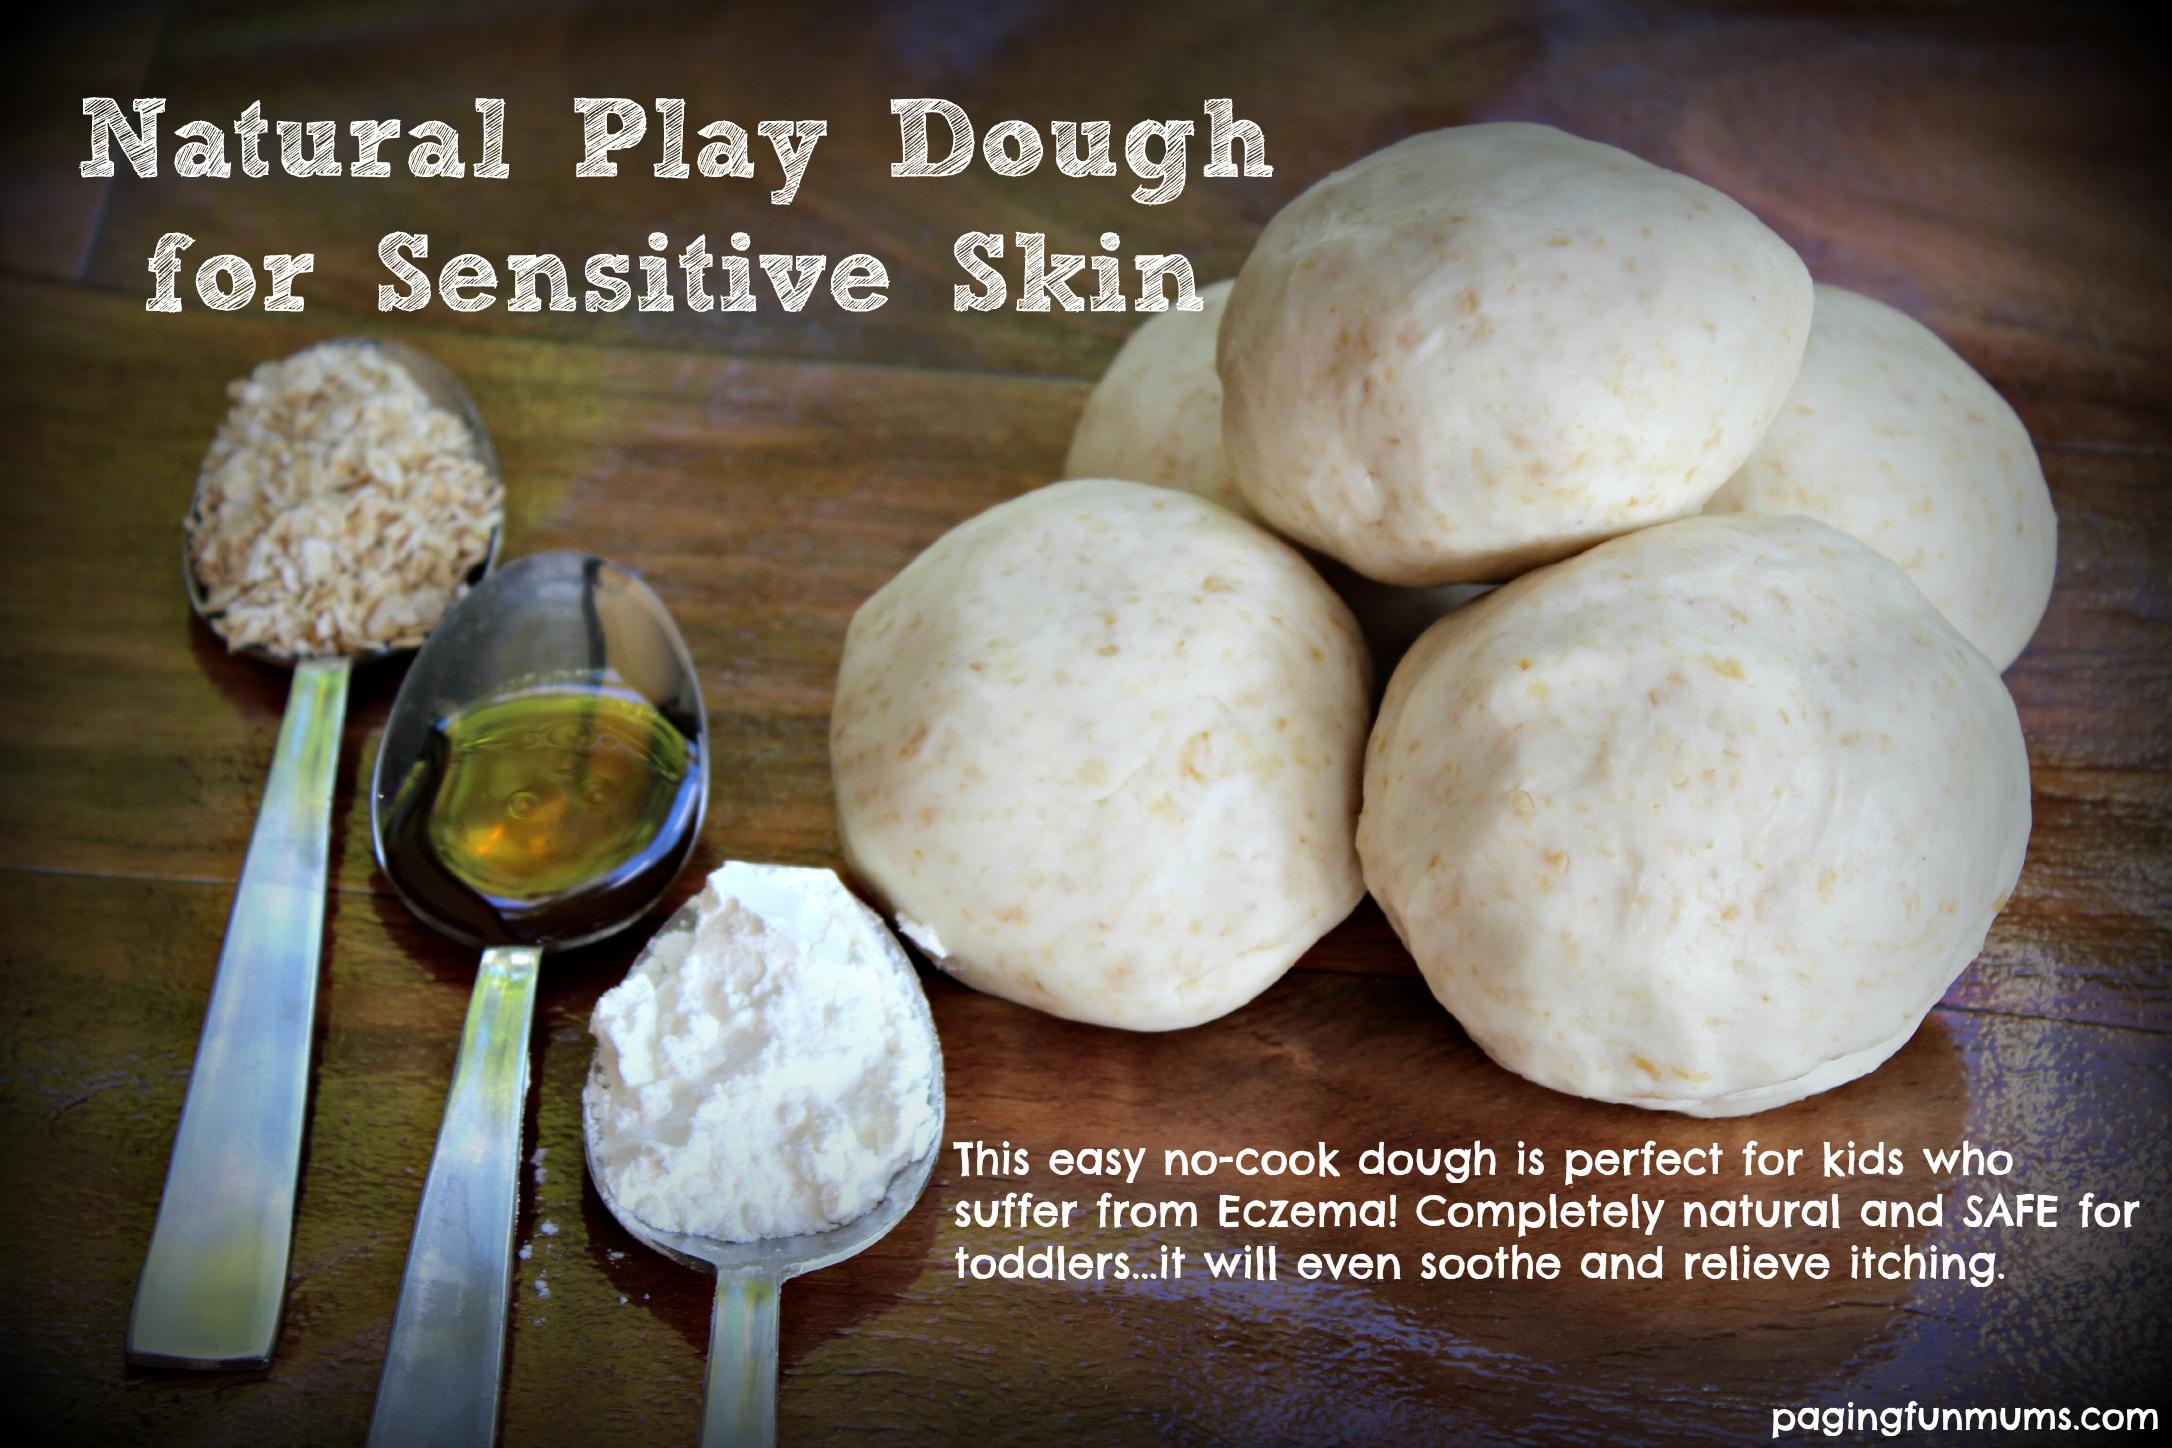 Natural Play Dough Recipe for Sensitive Skin